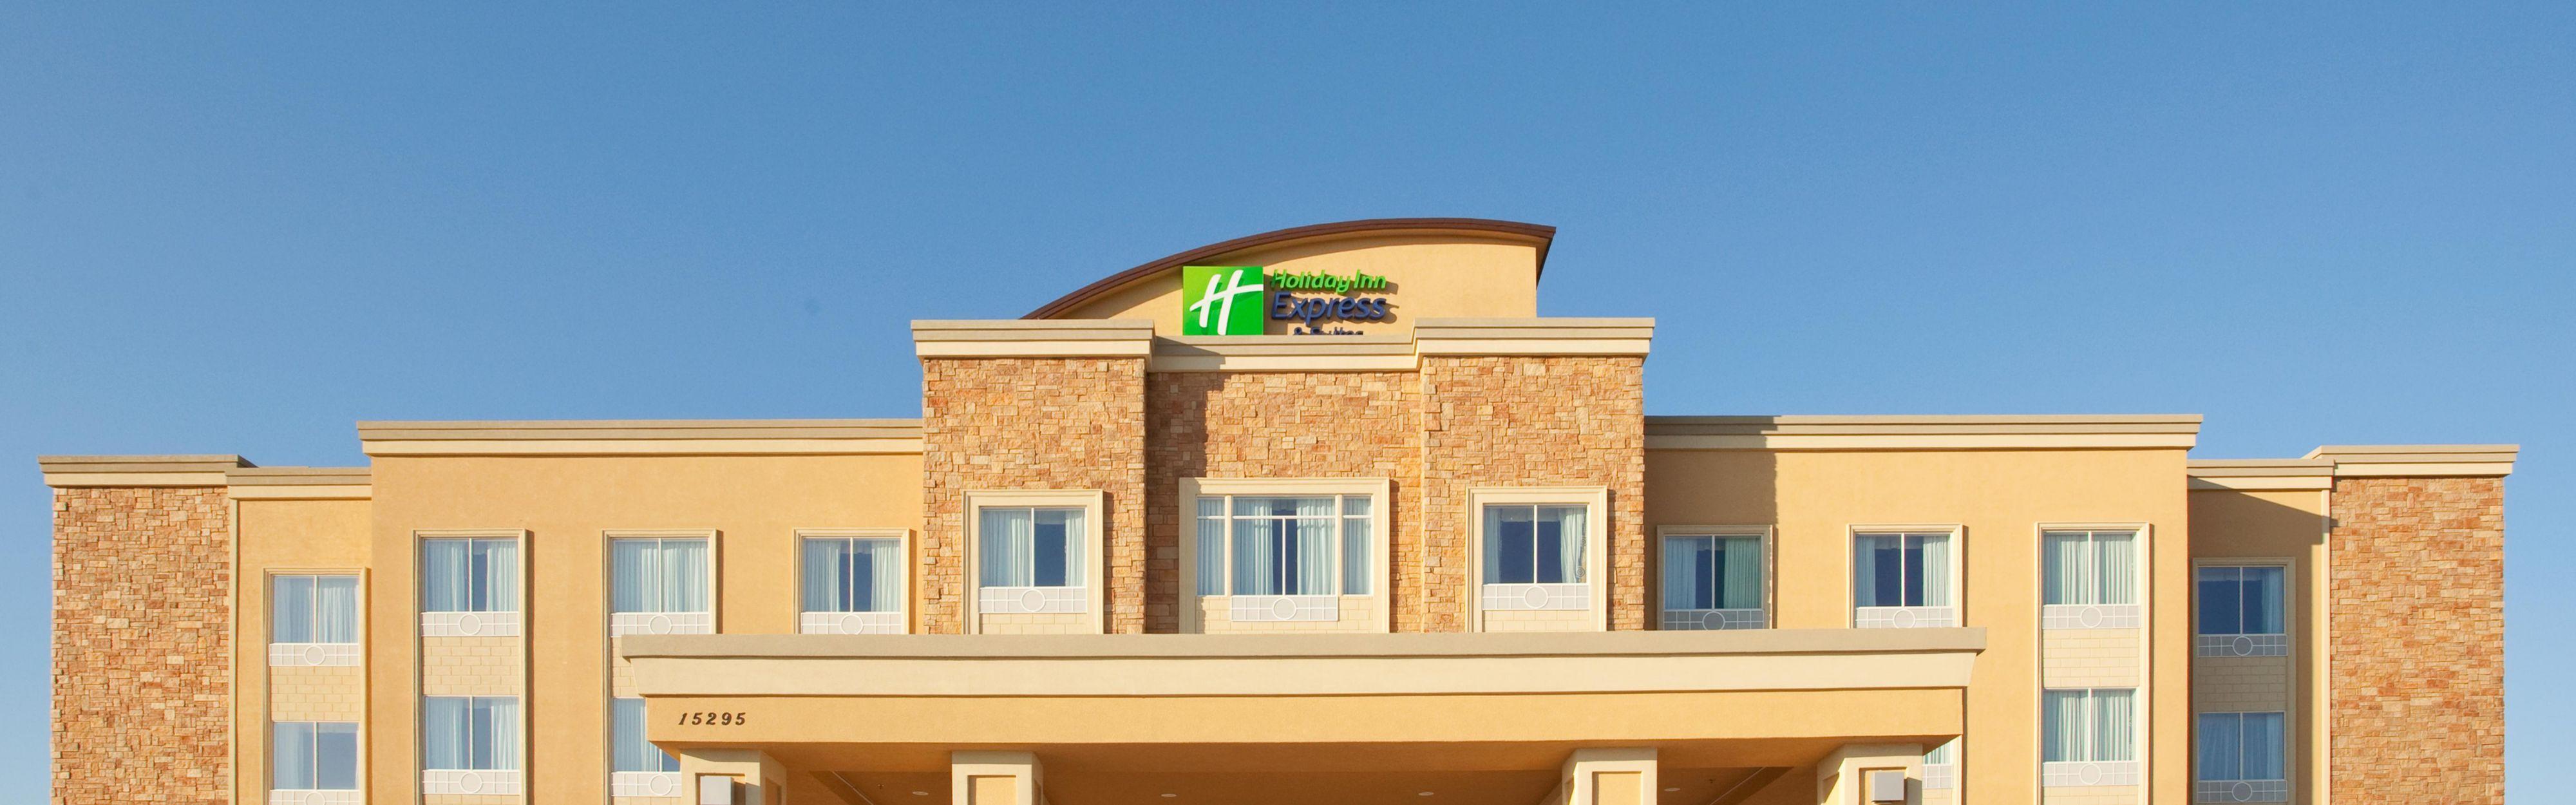 Buda Tx Hotels Motels